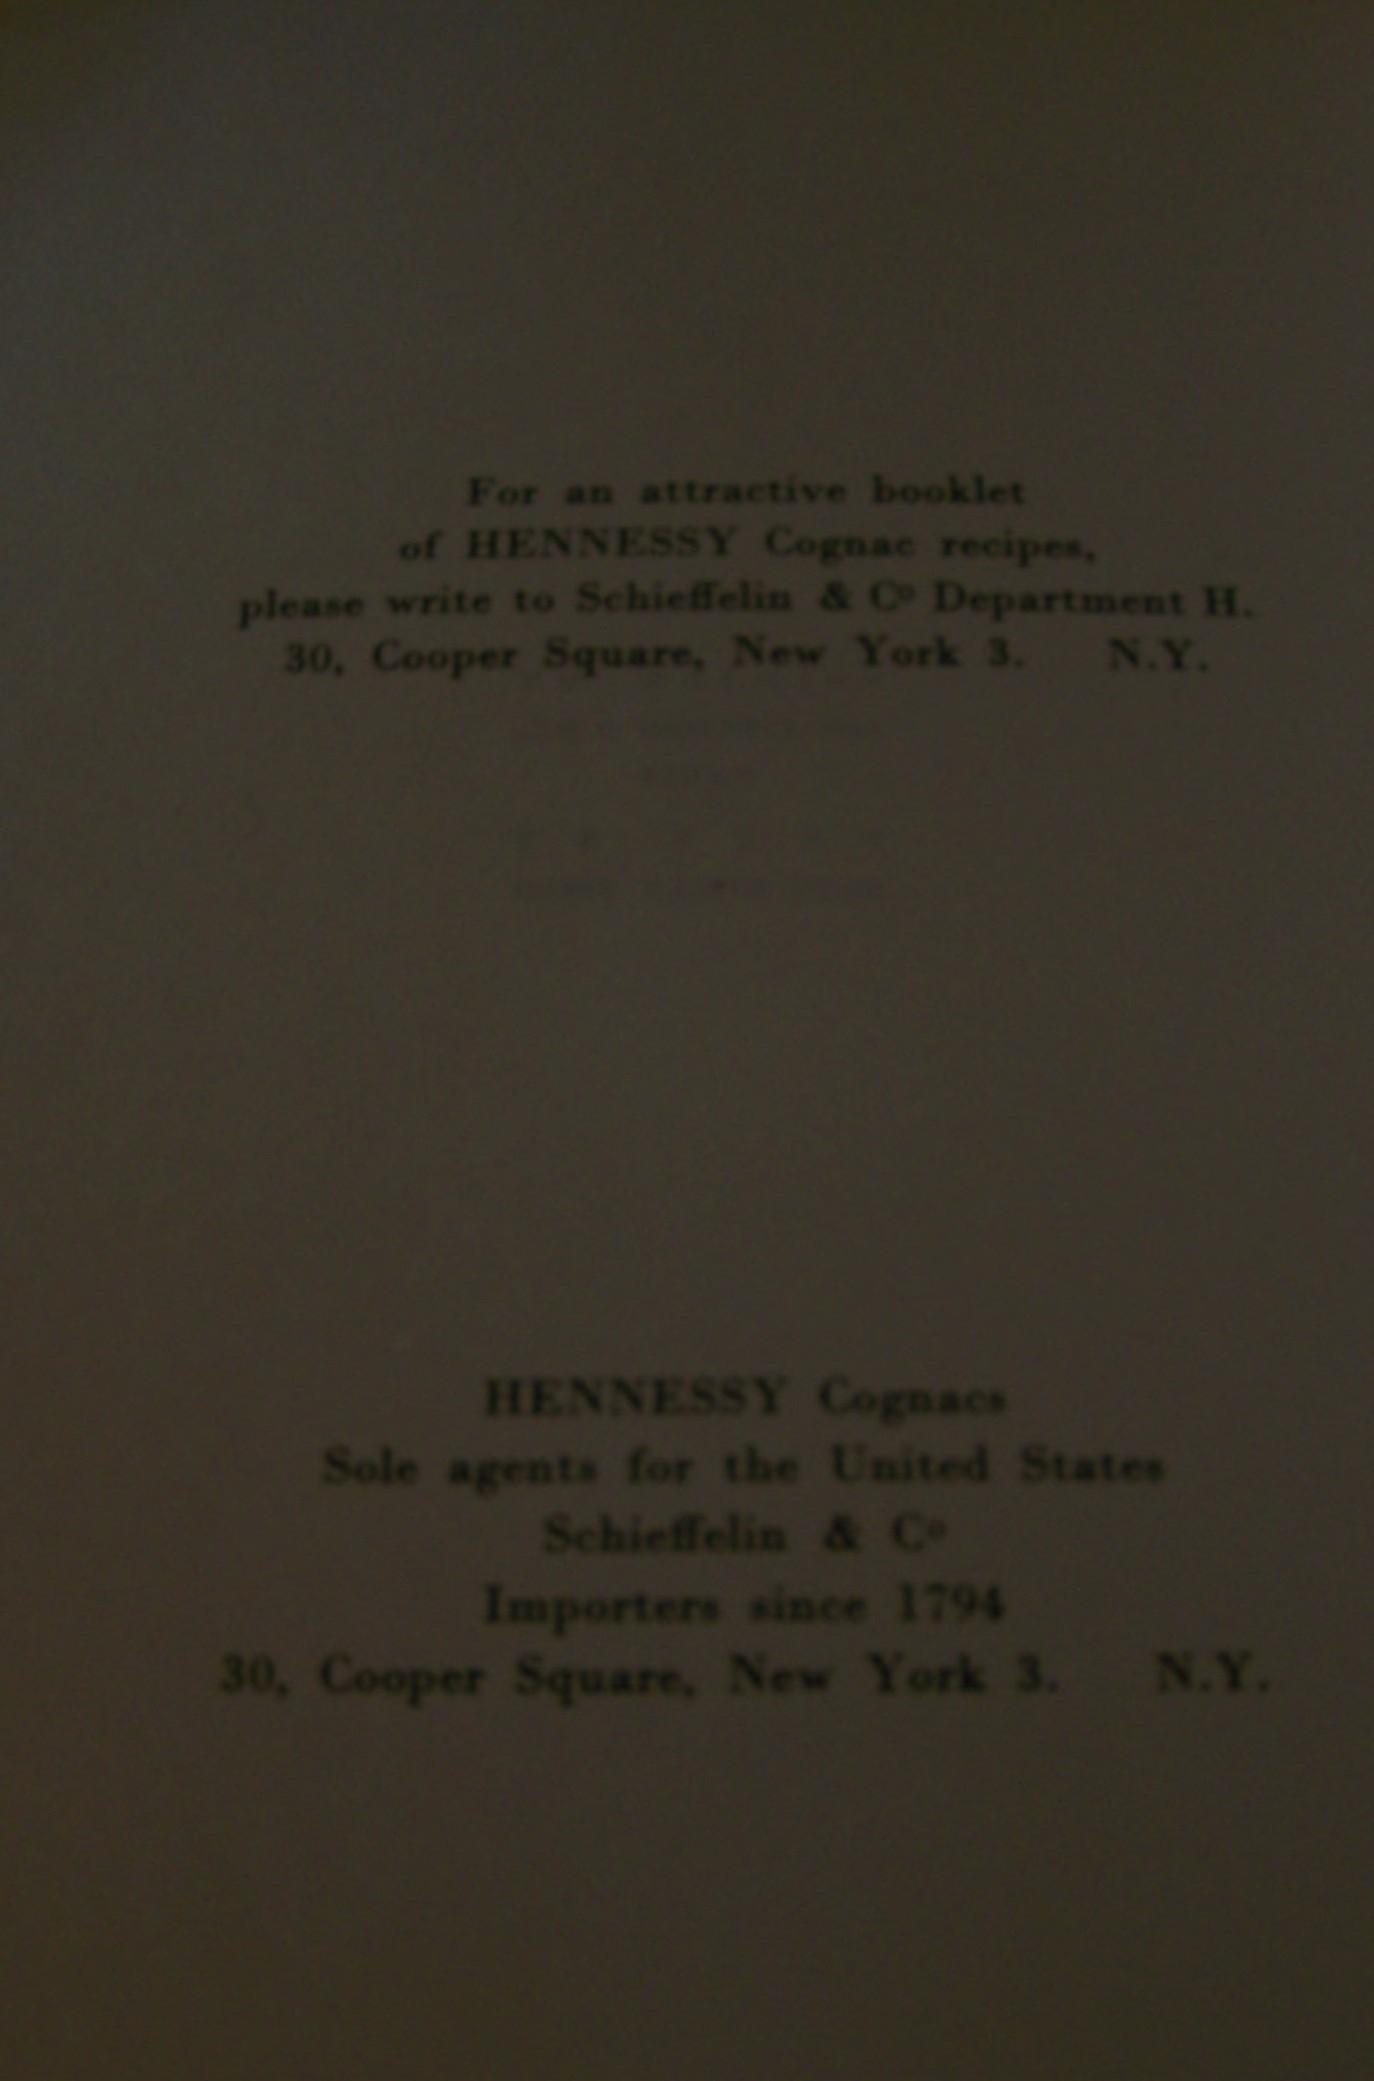 Hennessy Glassware